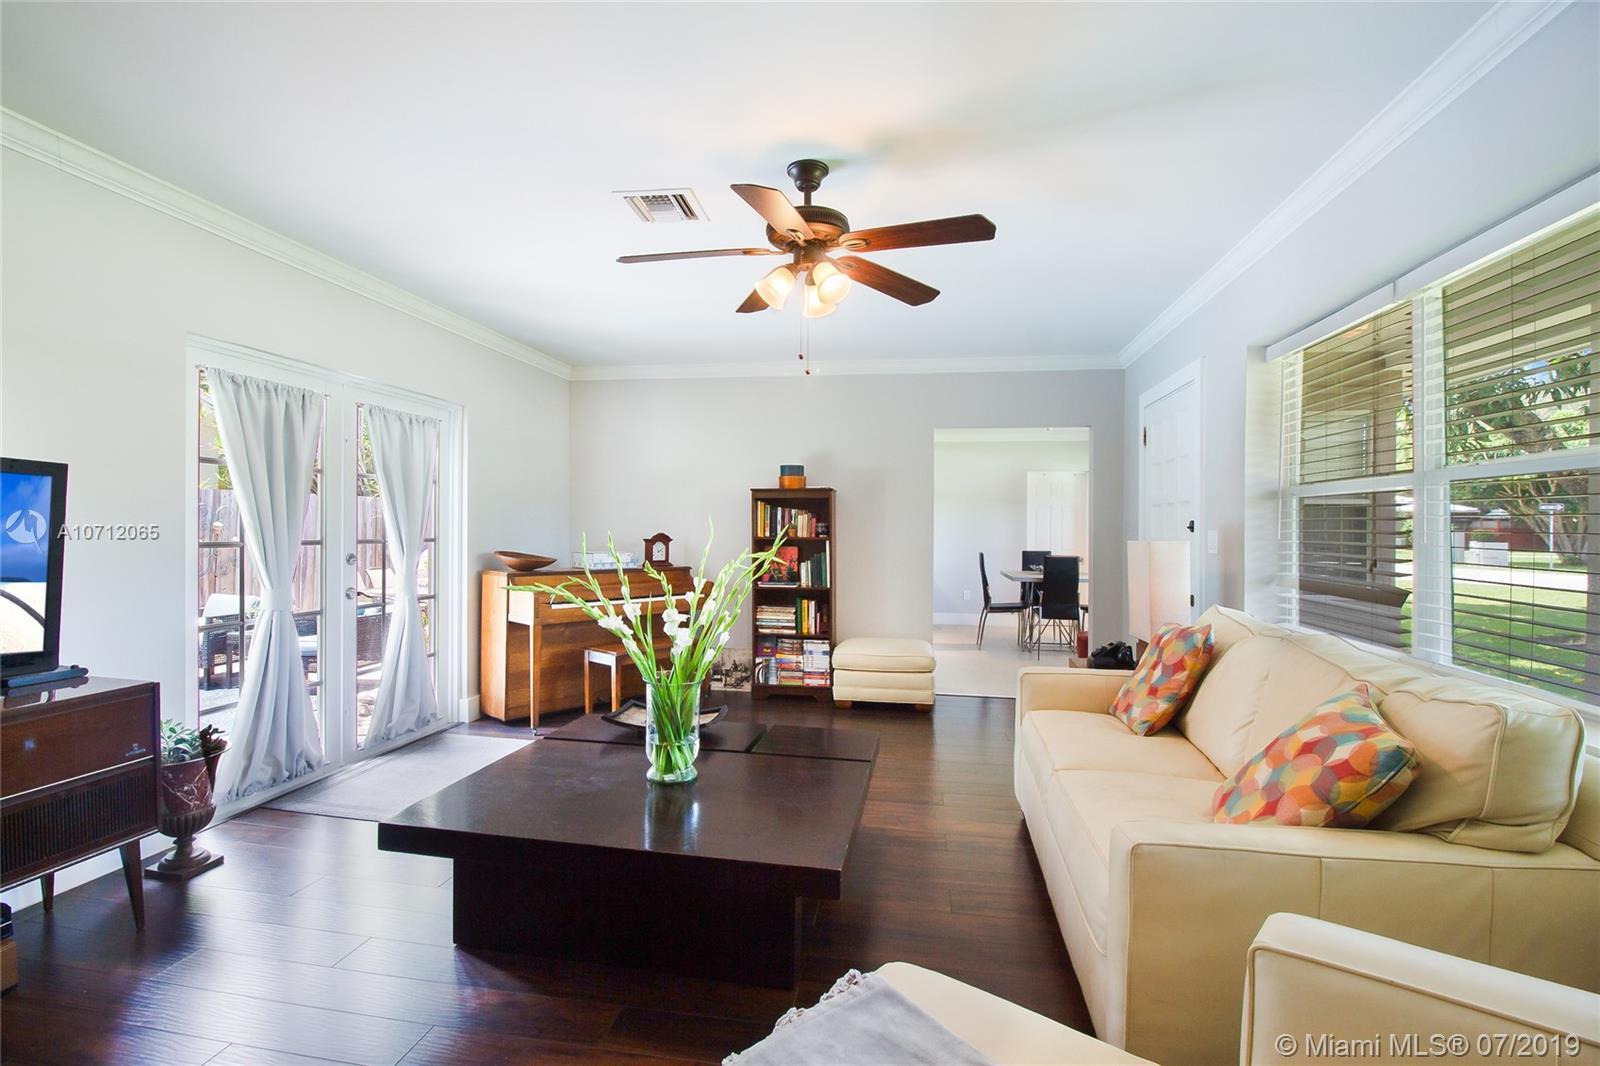 11990 NE 7th Ave Property Photo - Biscayne Park, FL real estate listing